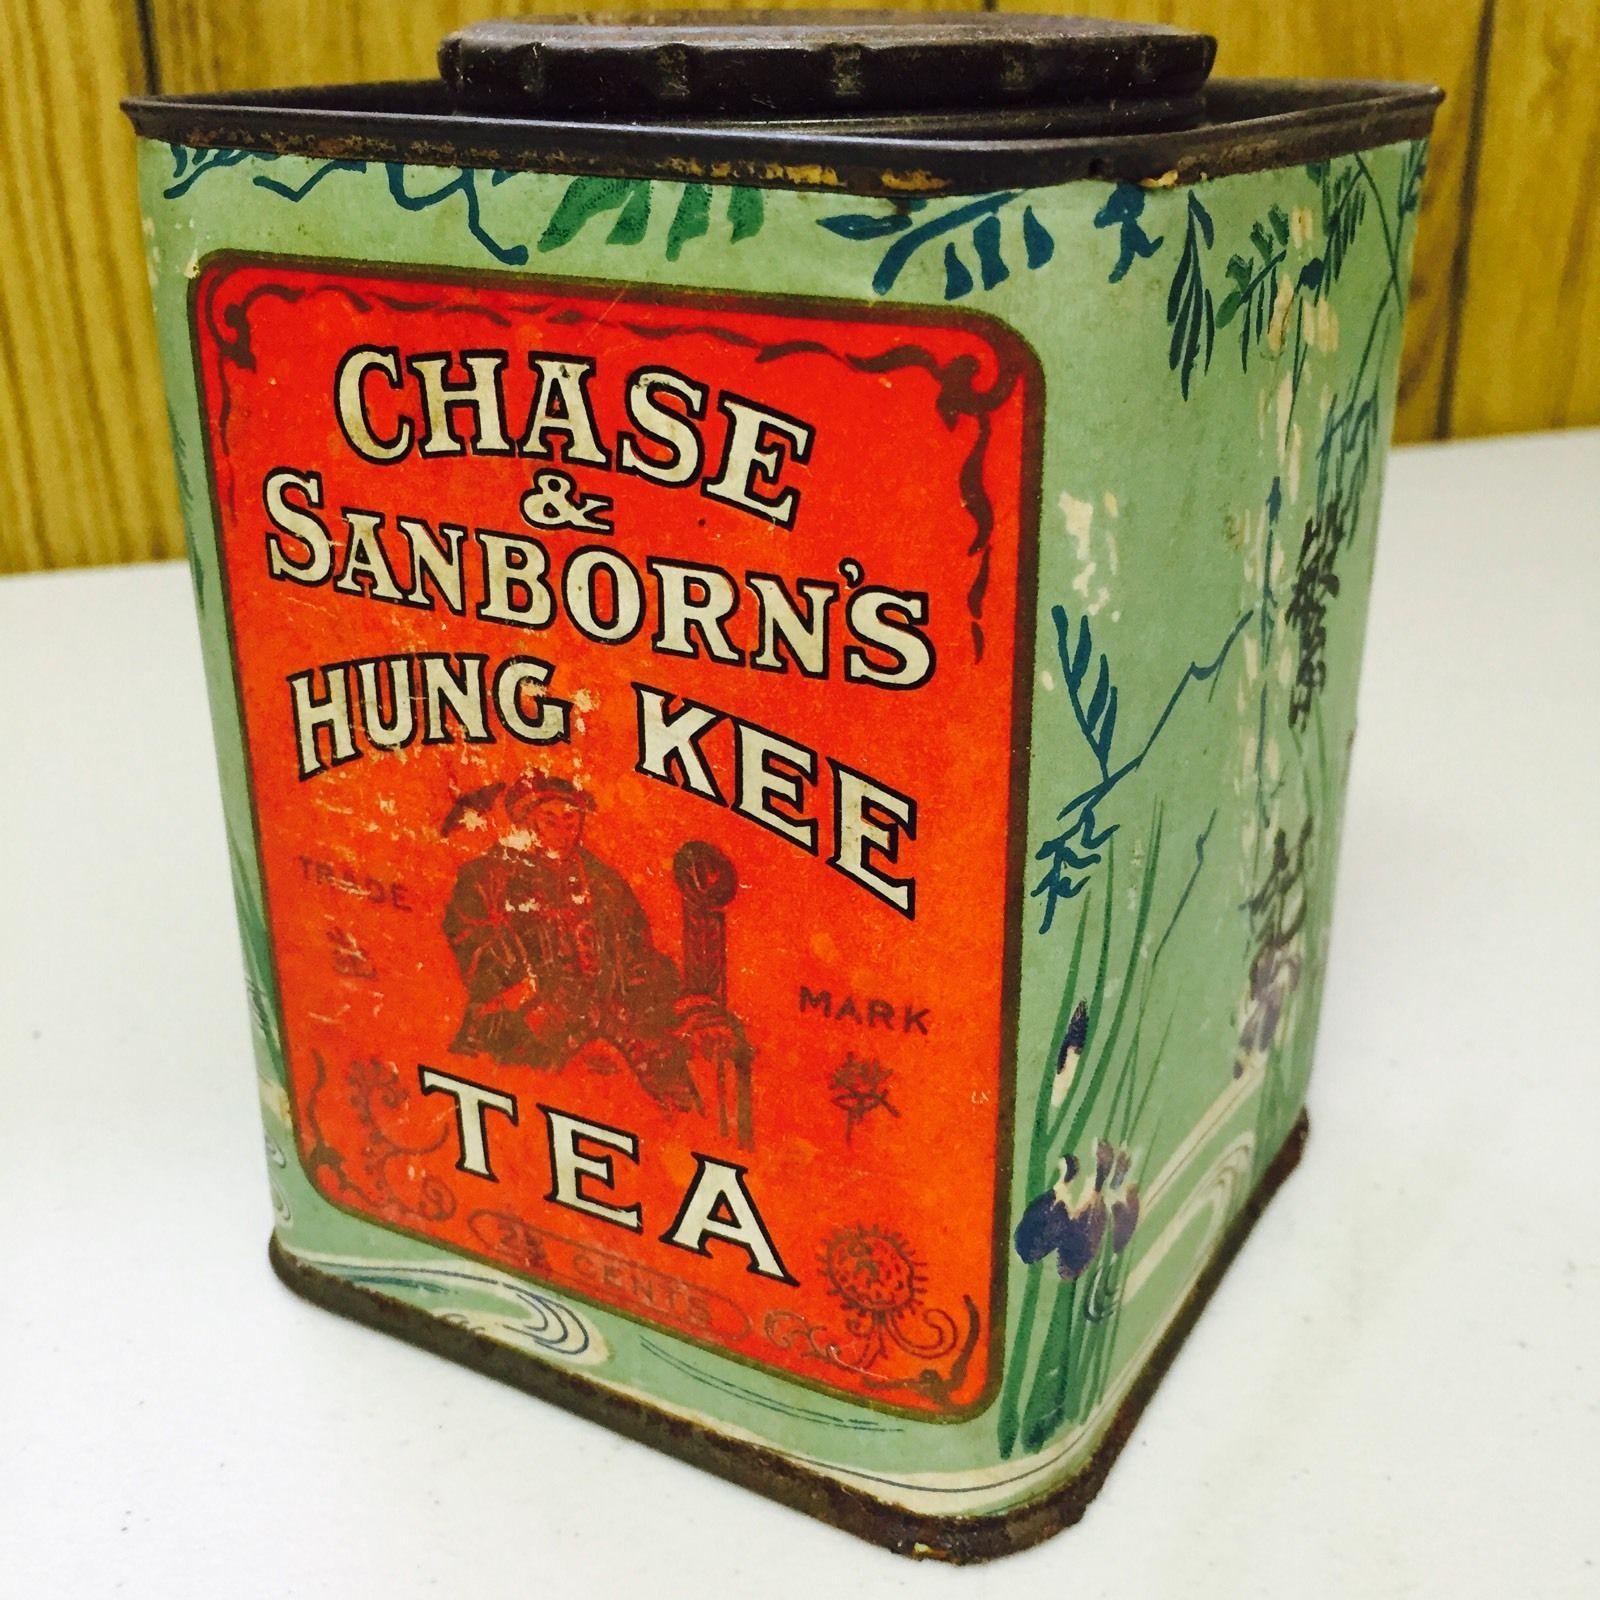 Chase Sanborn S Hung Kee Tea Tin Red Label On Green Leaf Pattern Rectangular Tin C Early Mid 20th Centu Vintage Tea Tins Tea Tin Boxes Tea Cups Vintage